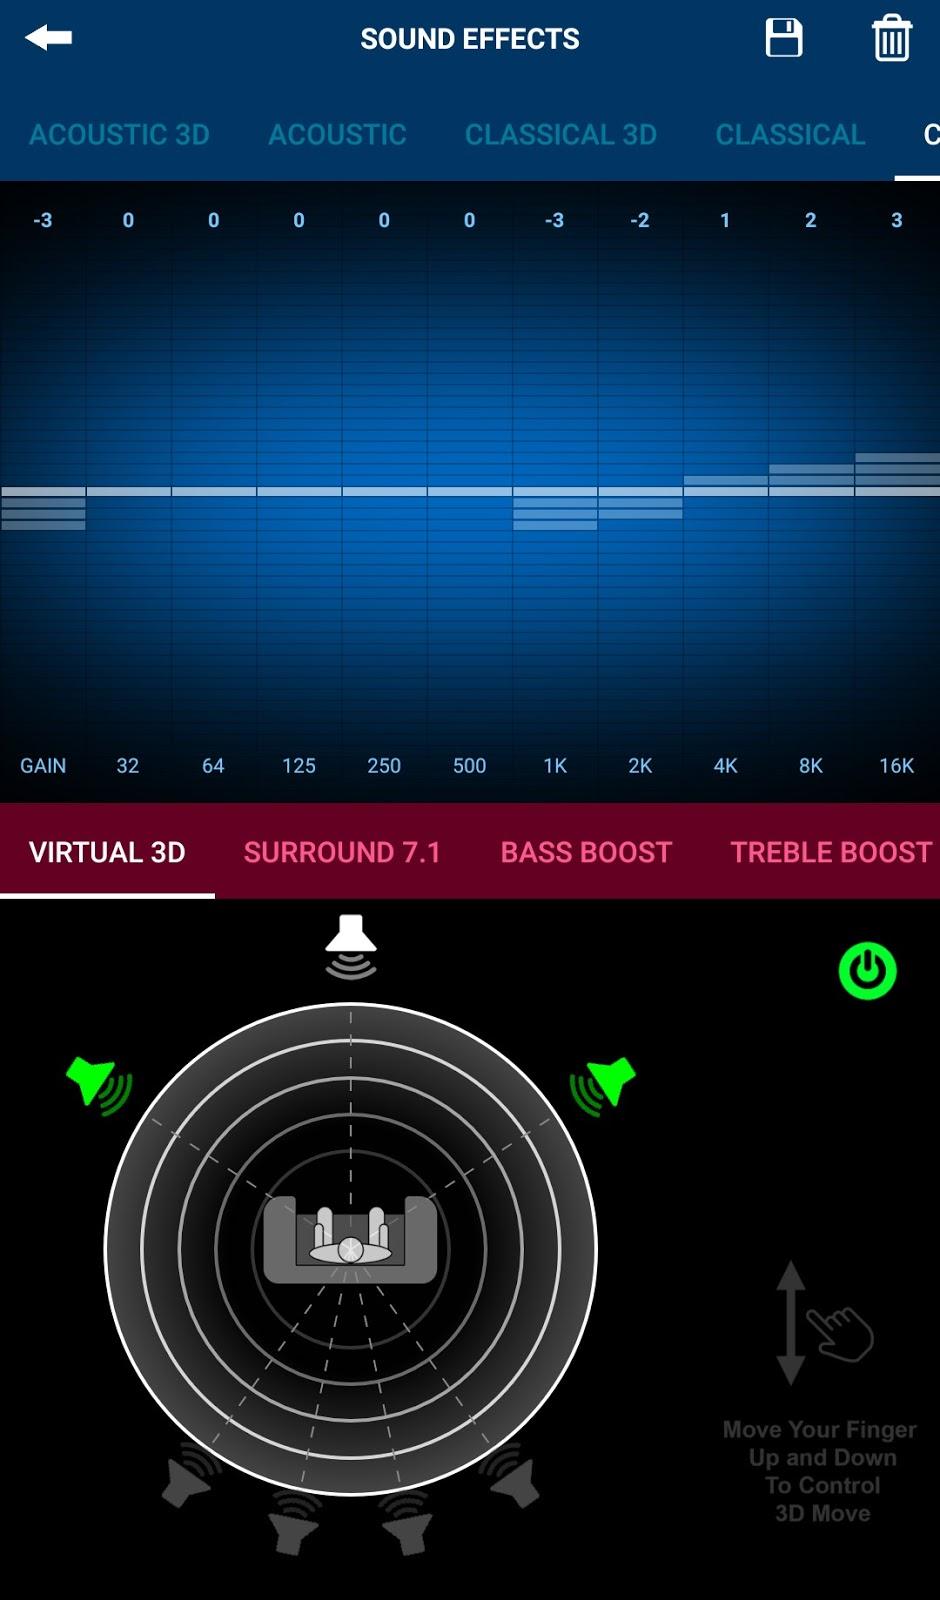 xplayer virtual 3D settings page